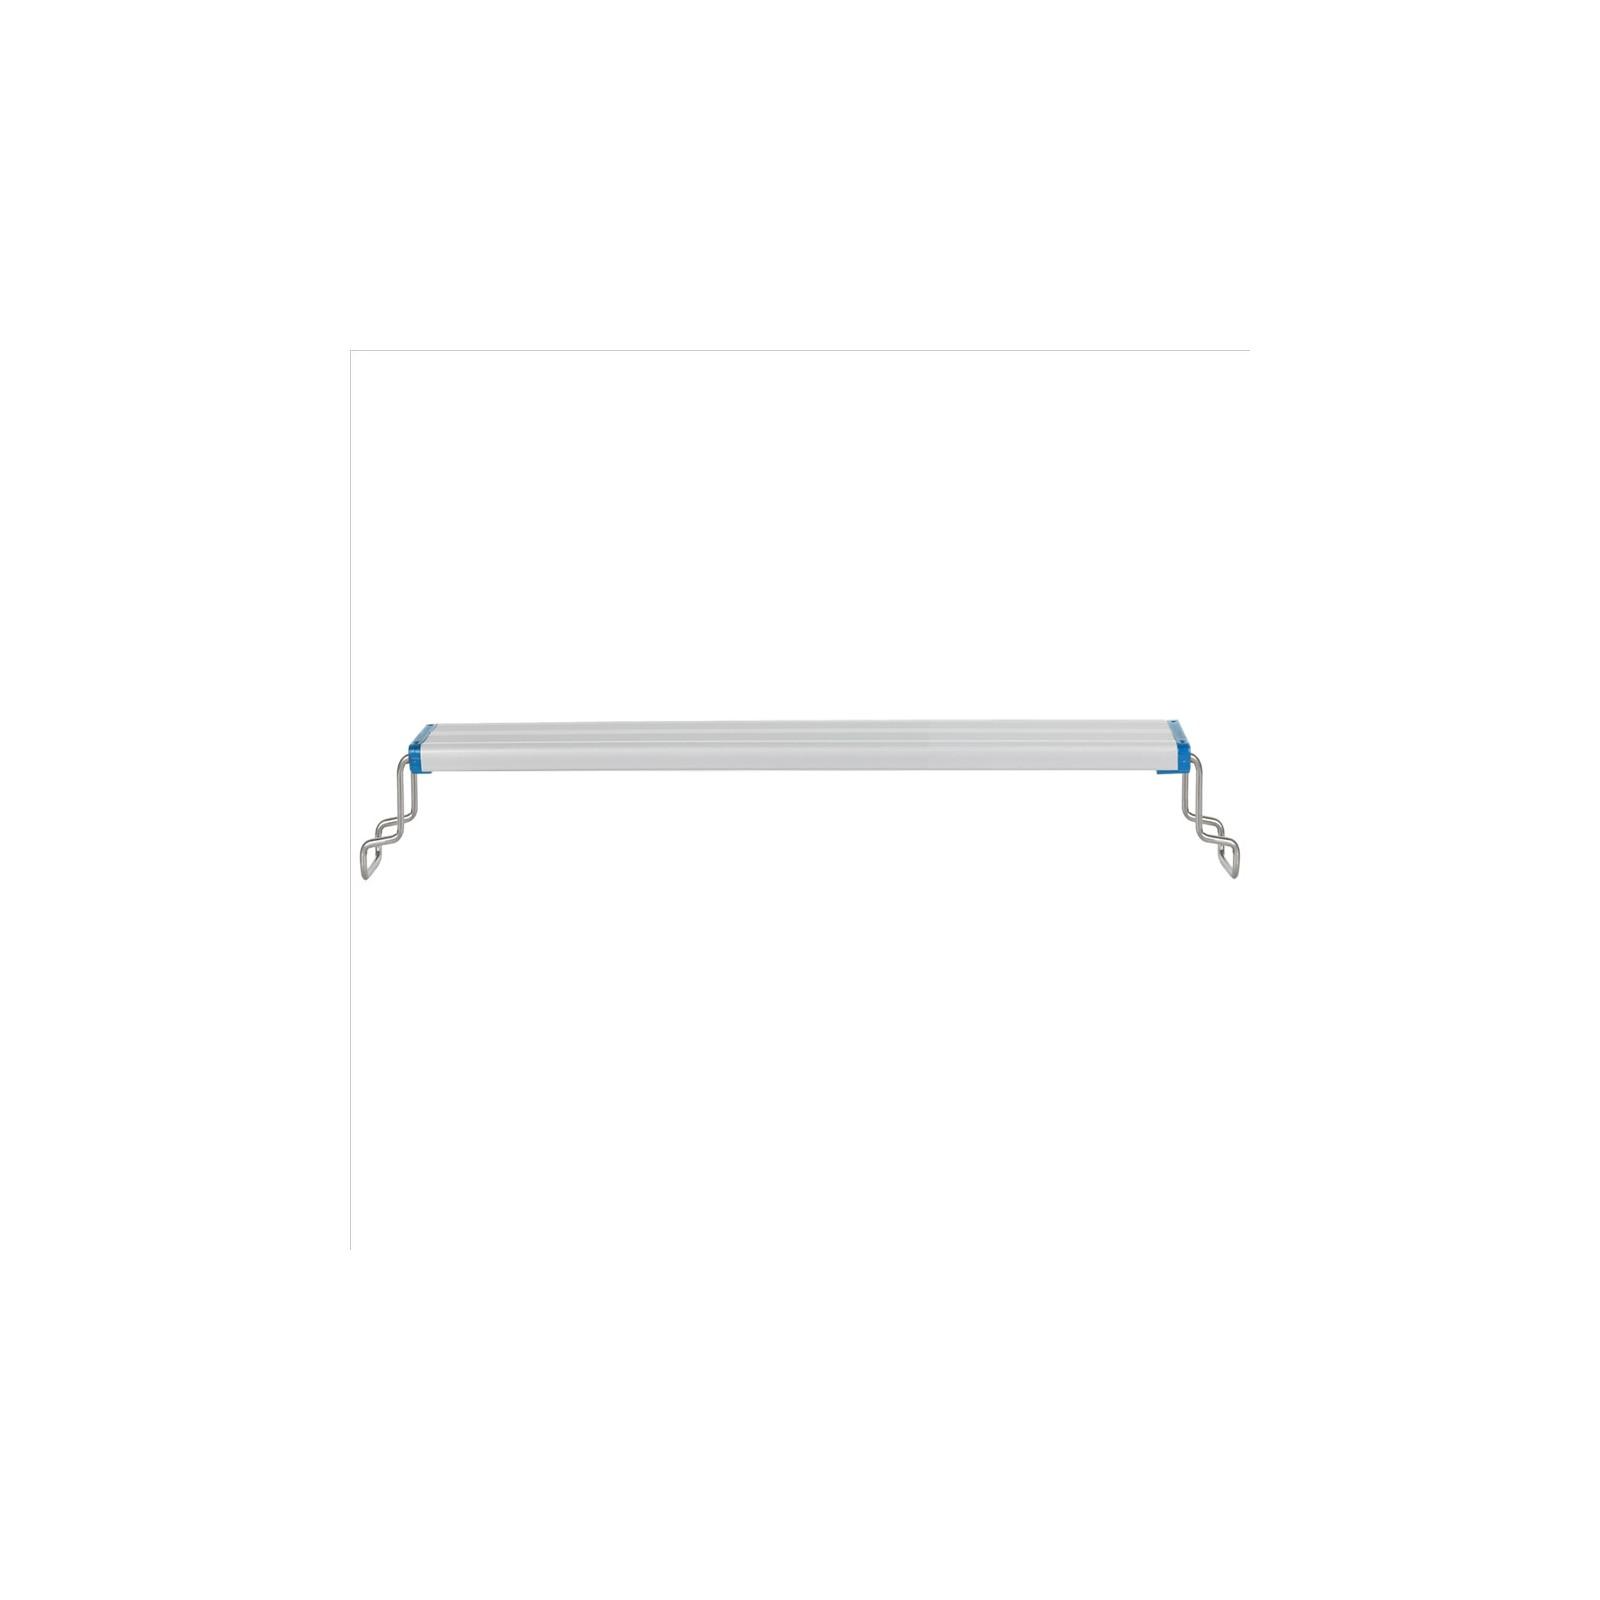 Aquazonic Evo Slim LED White Double - 90 cm